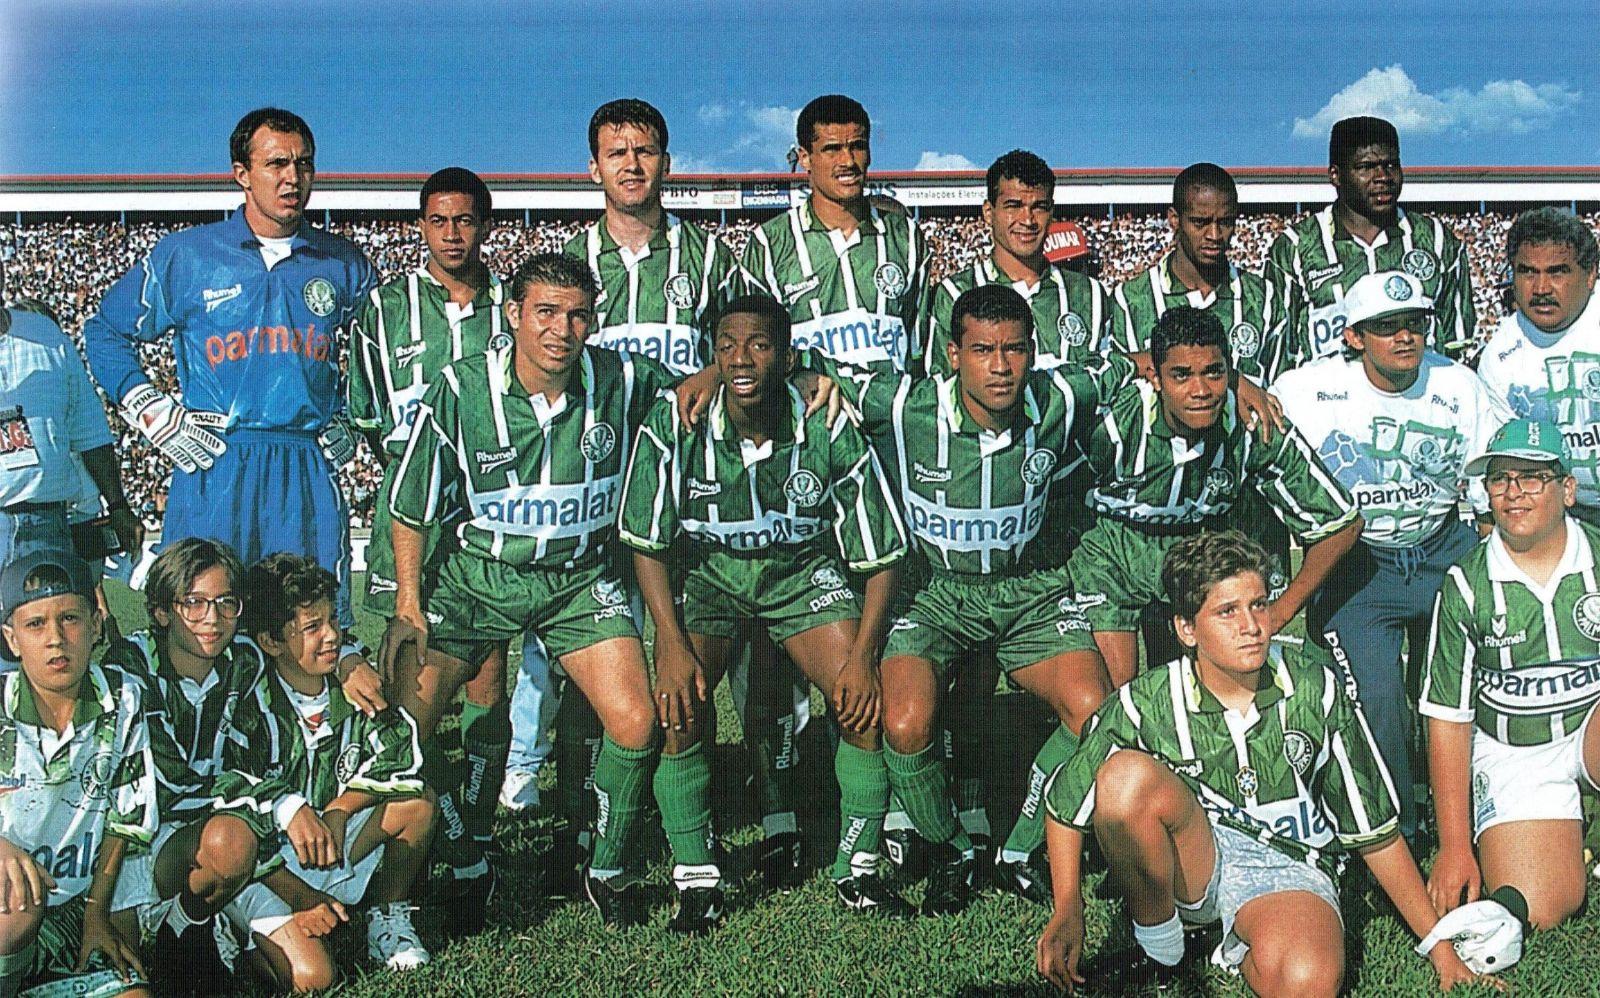 1996-palmeiras-parmalat